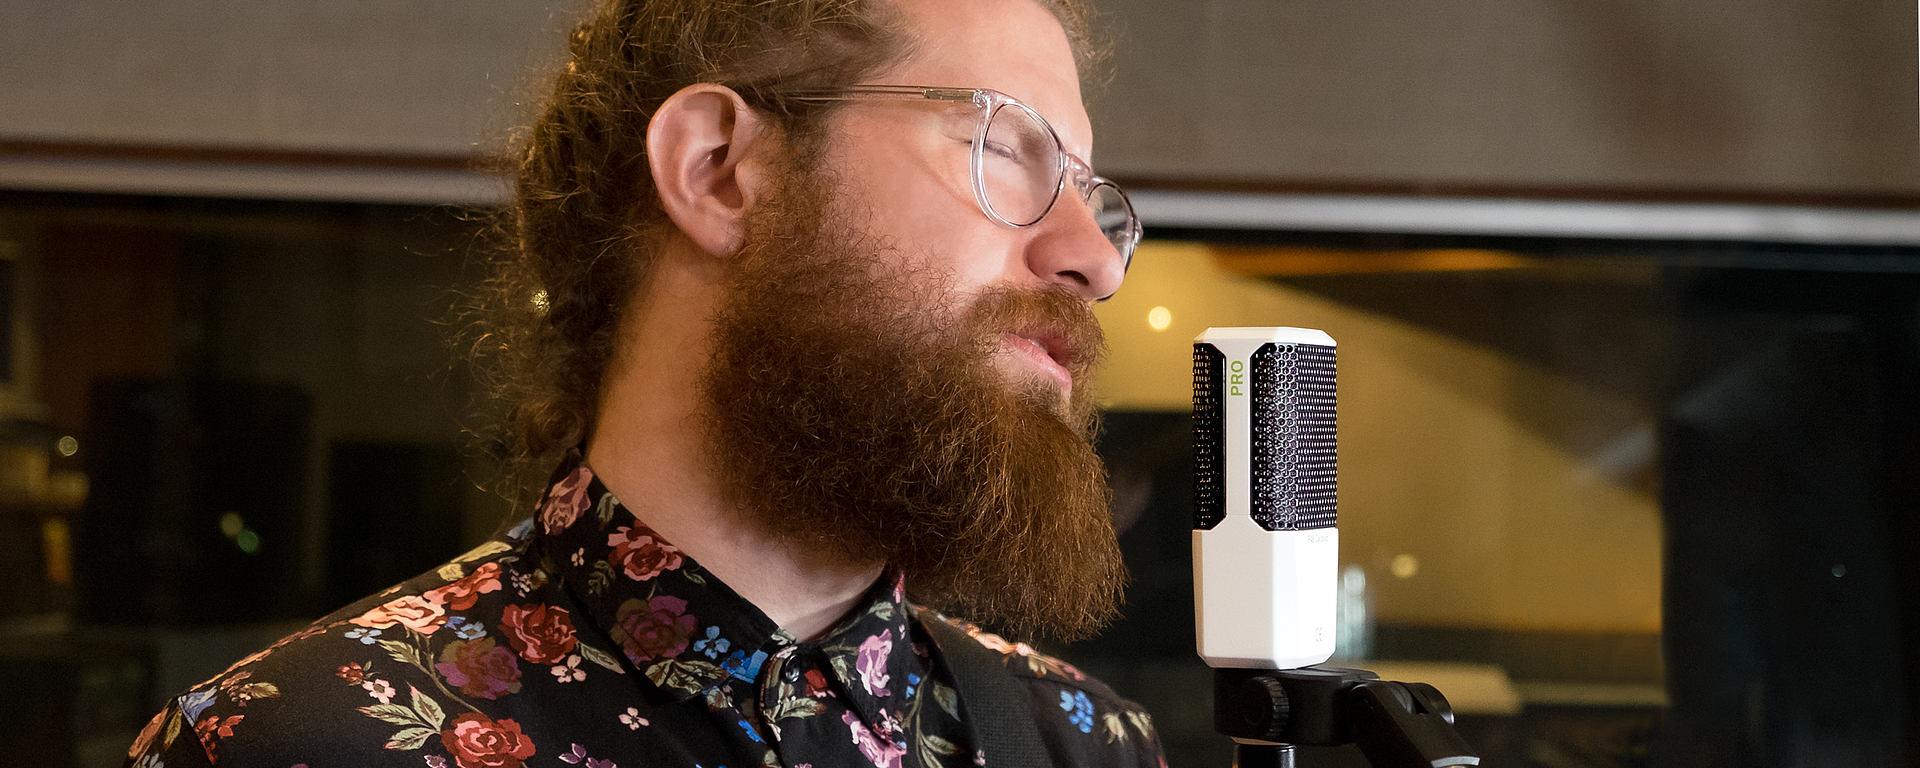 LCT 240 PRO vocals